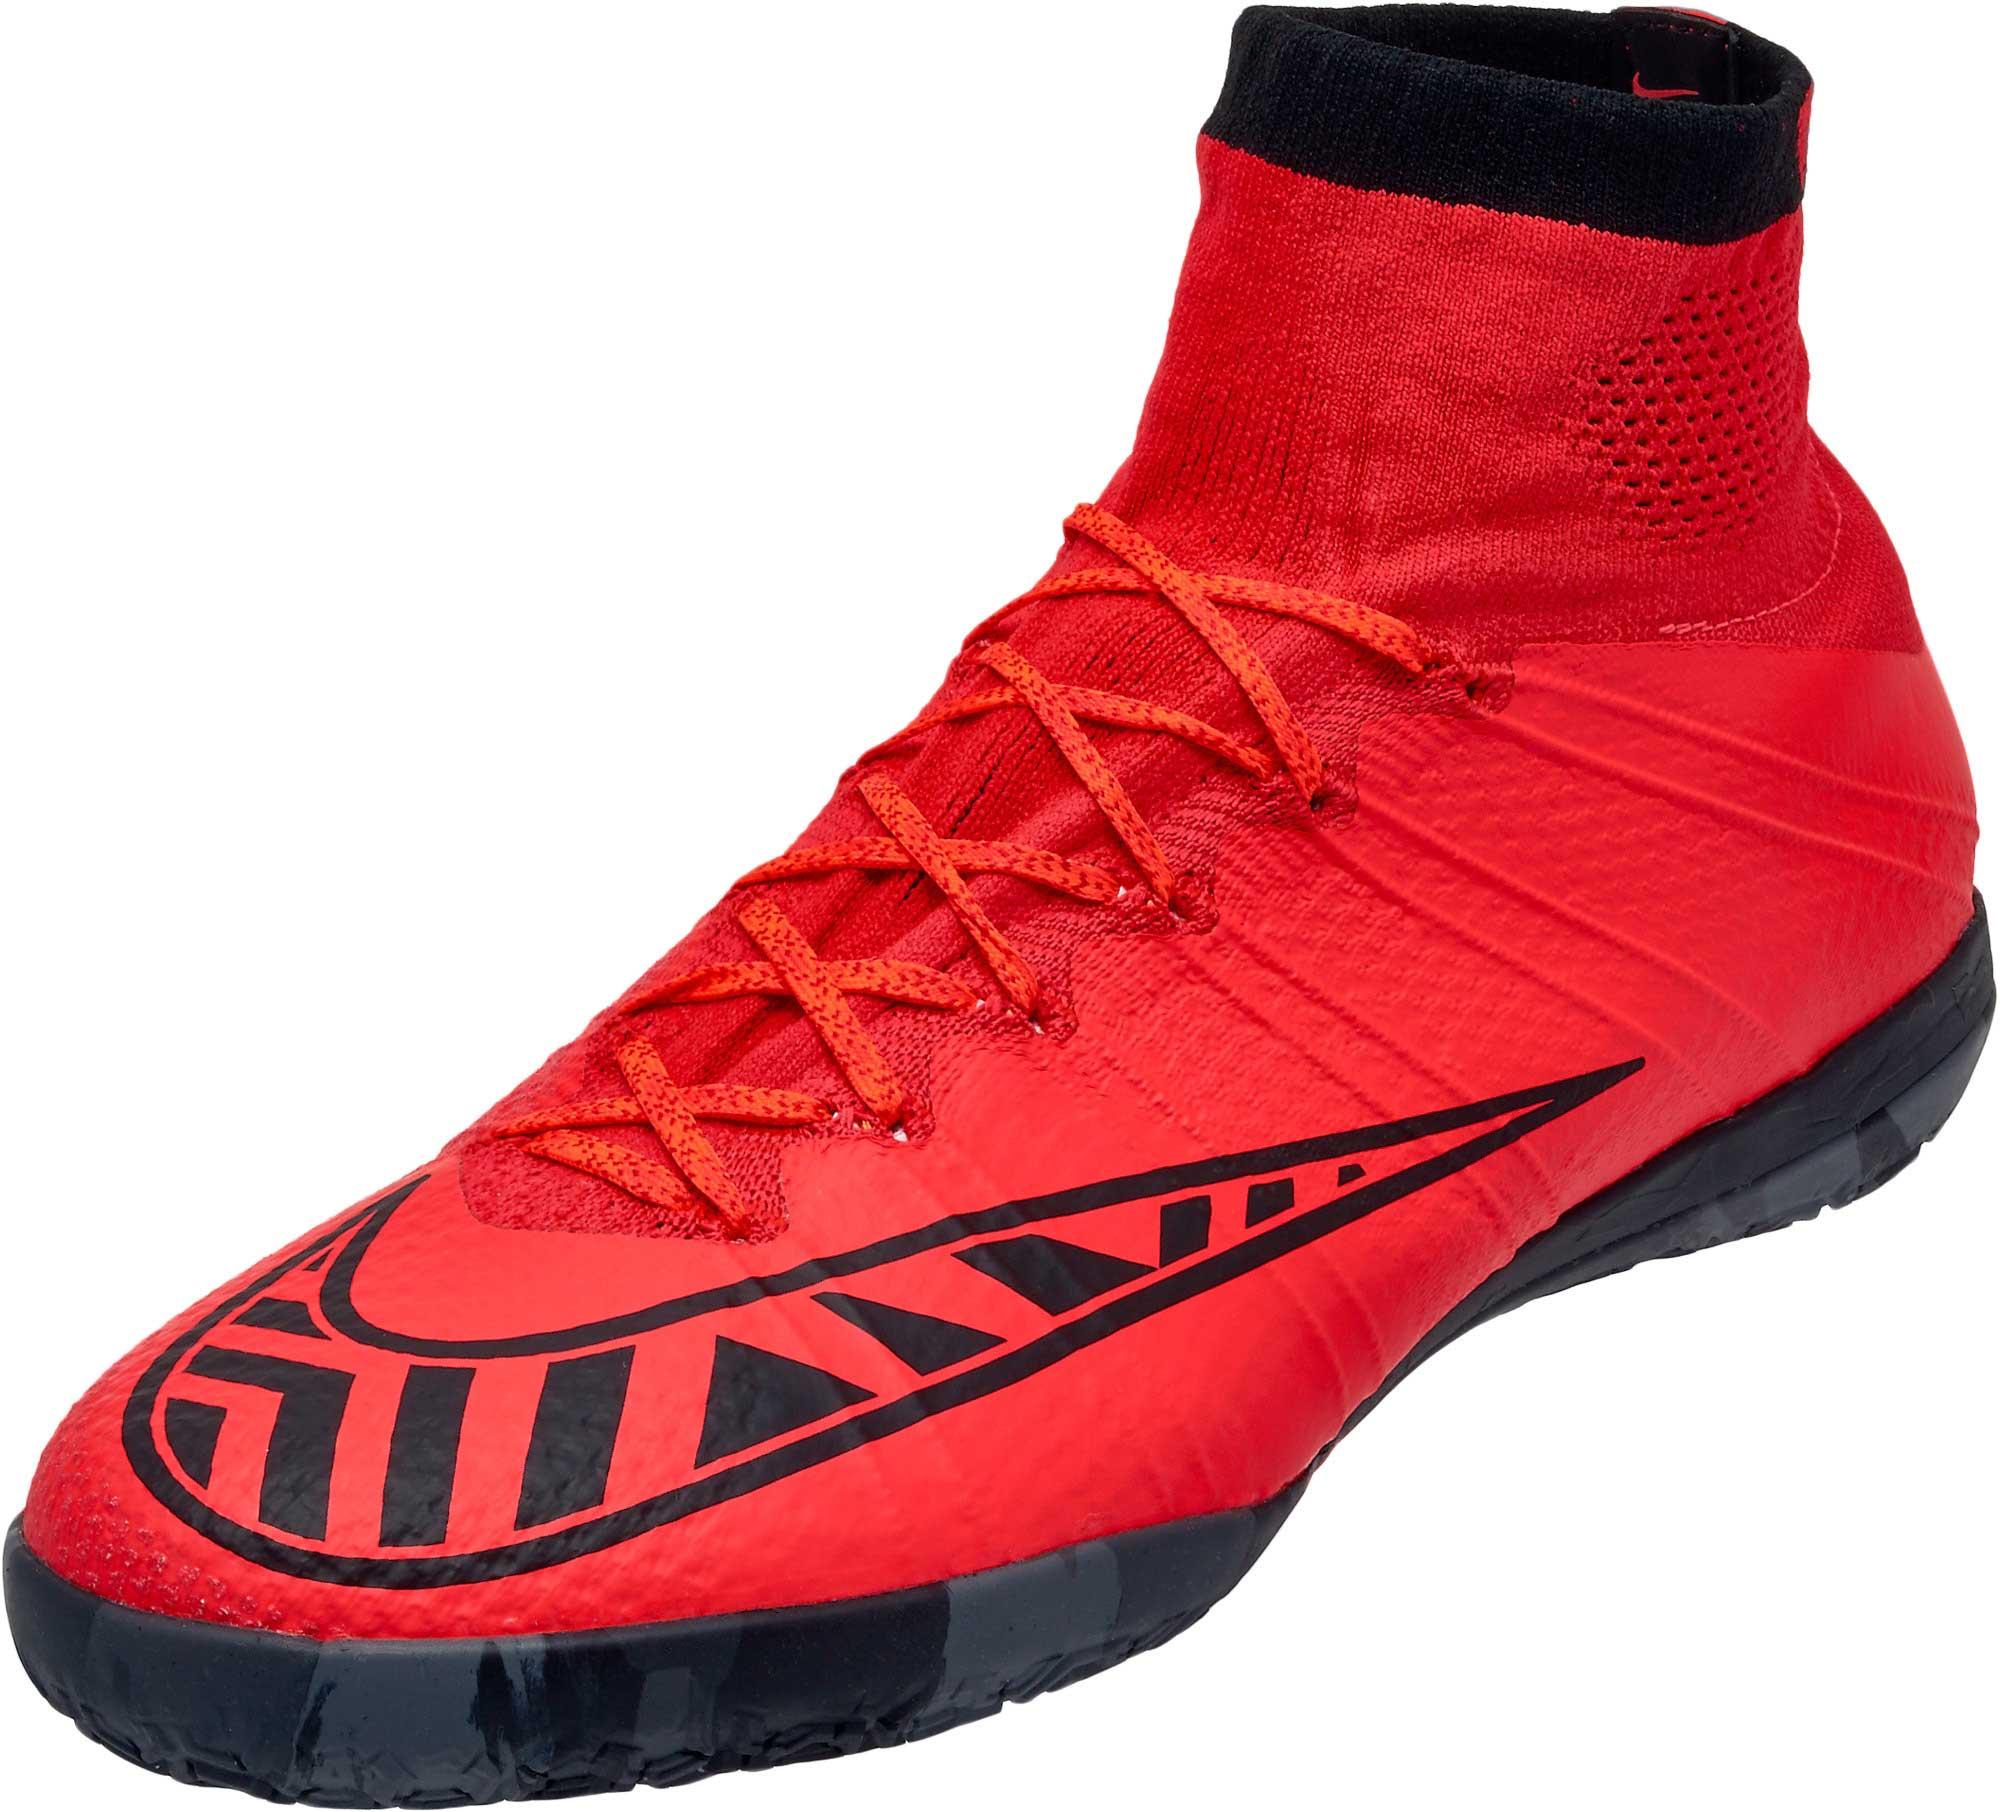 official photos 229c1 d7728 Nike MercurialX Proximo Indoor Shoes – Bright Crimson Hot Lava